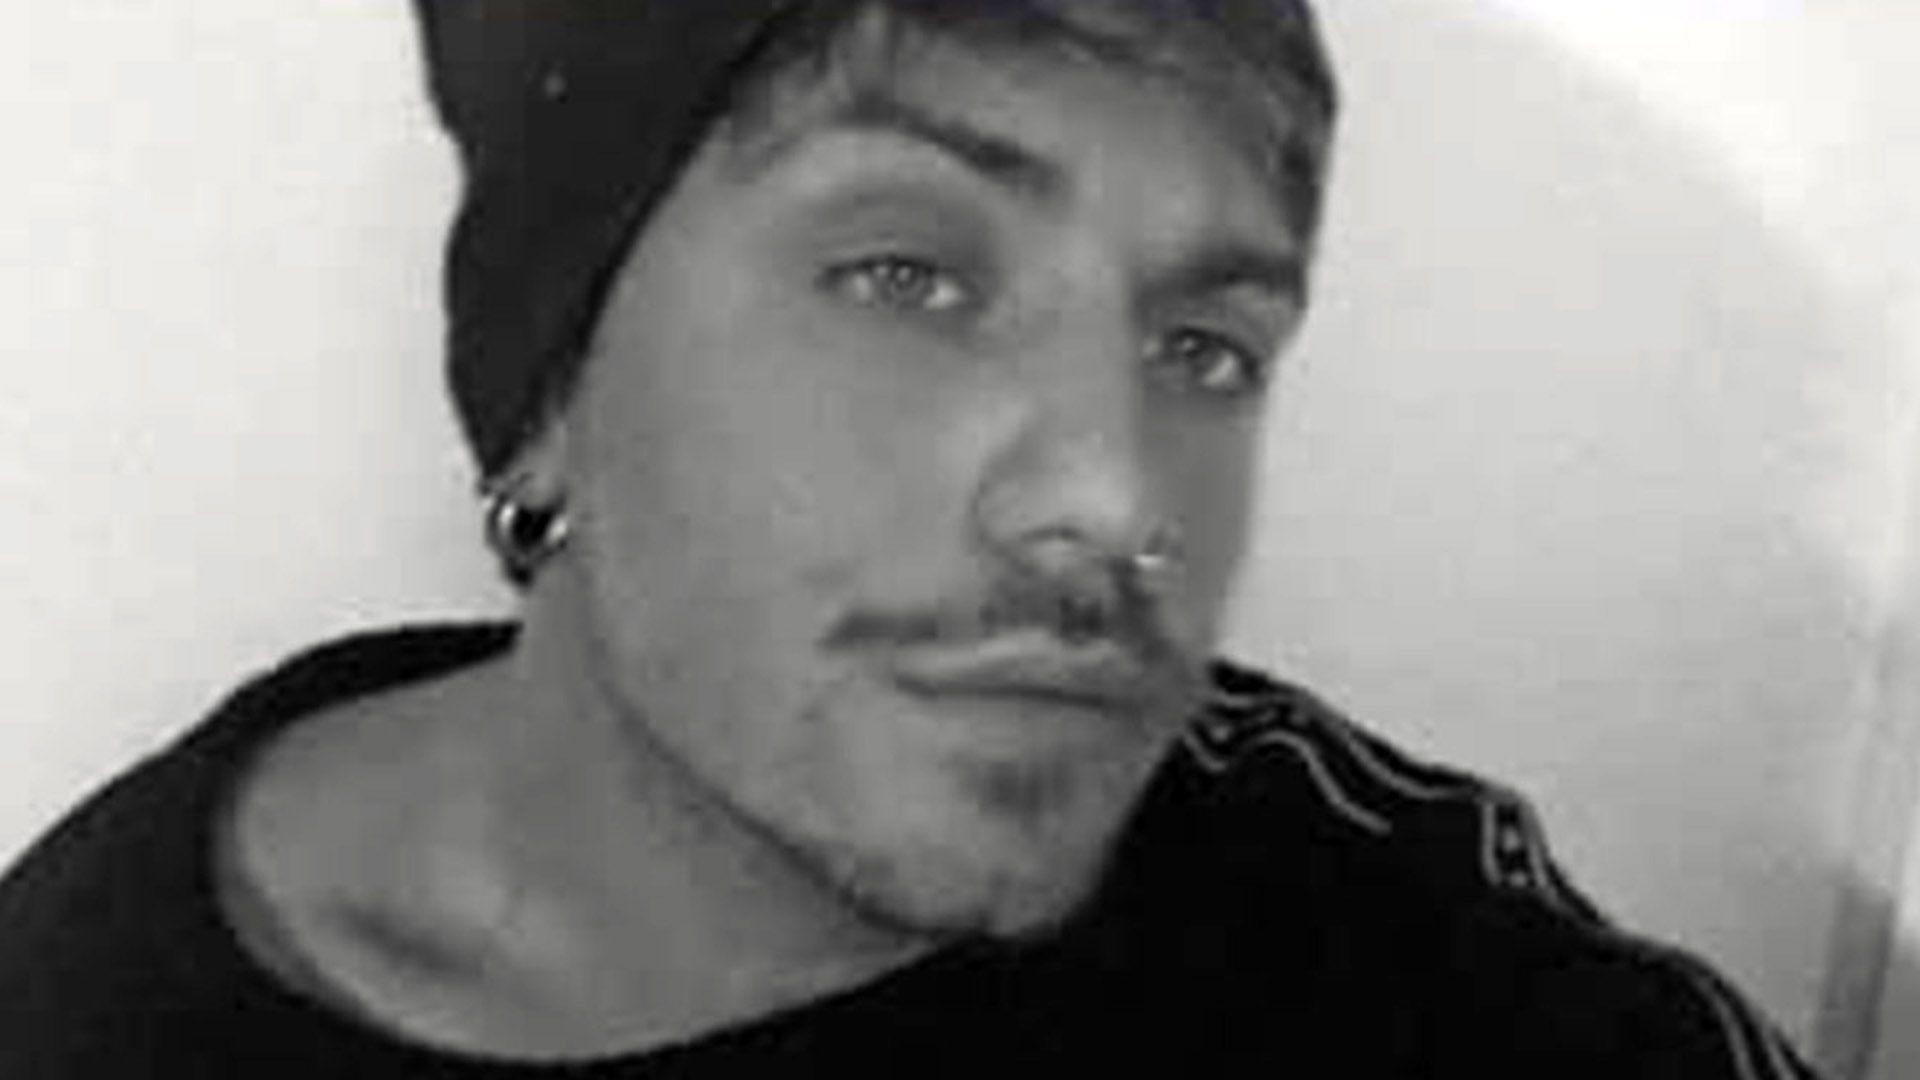 Búsqueda de Guido Orlando en country Escobar